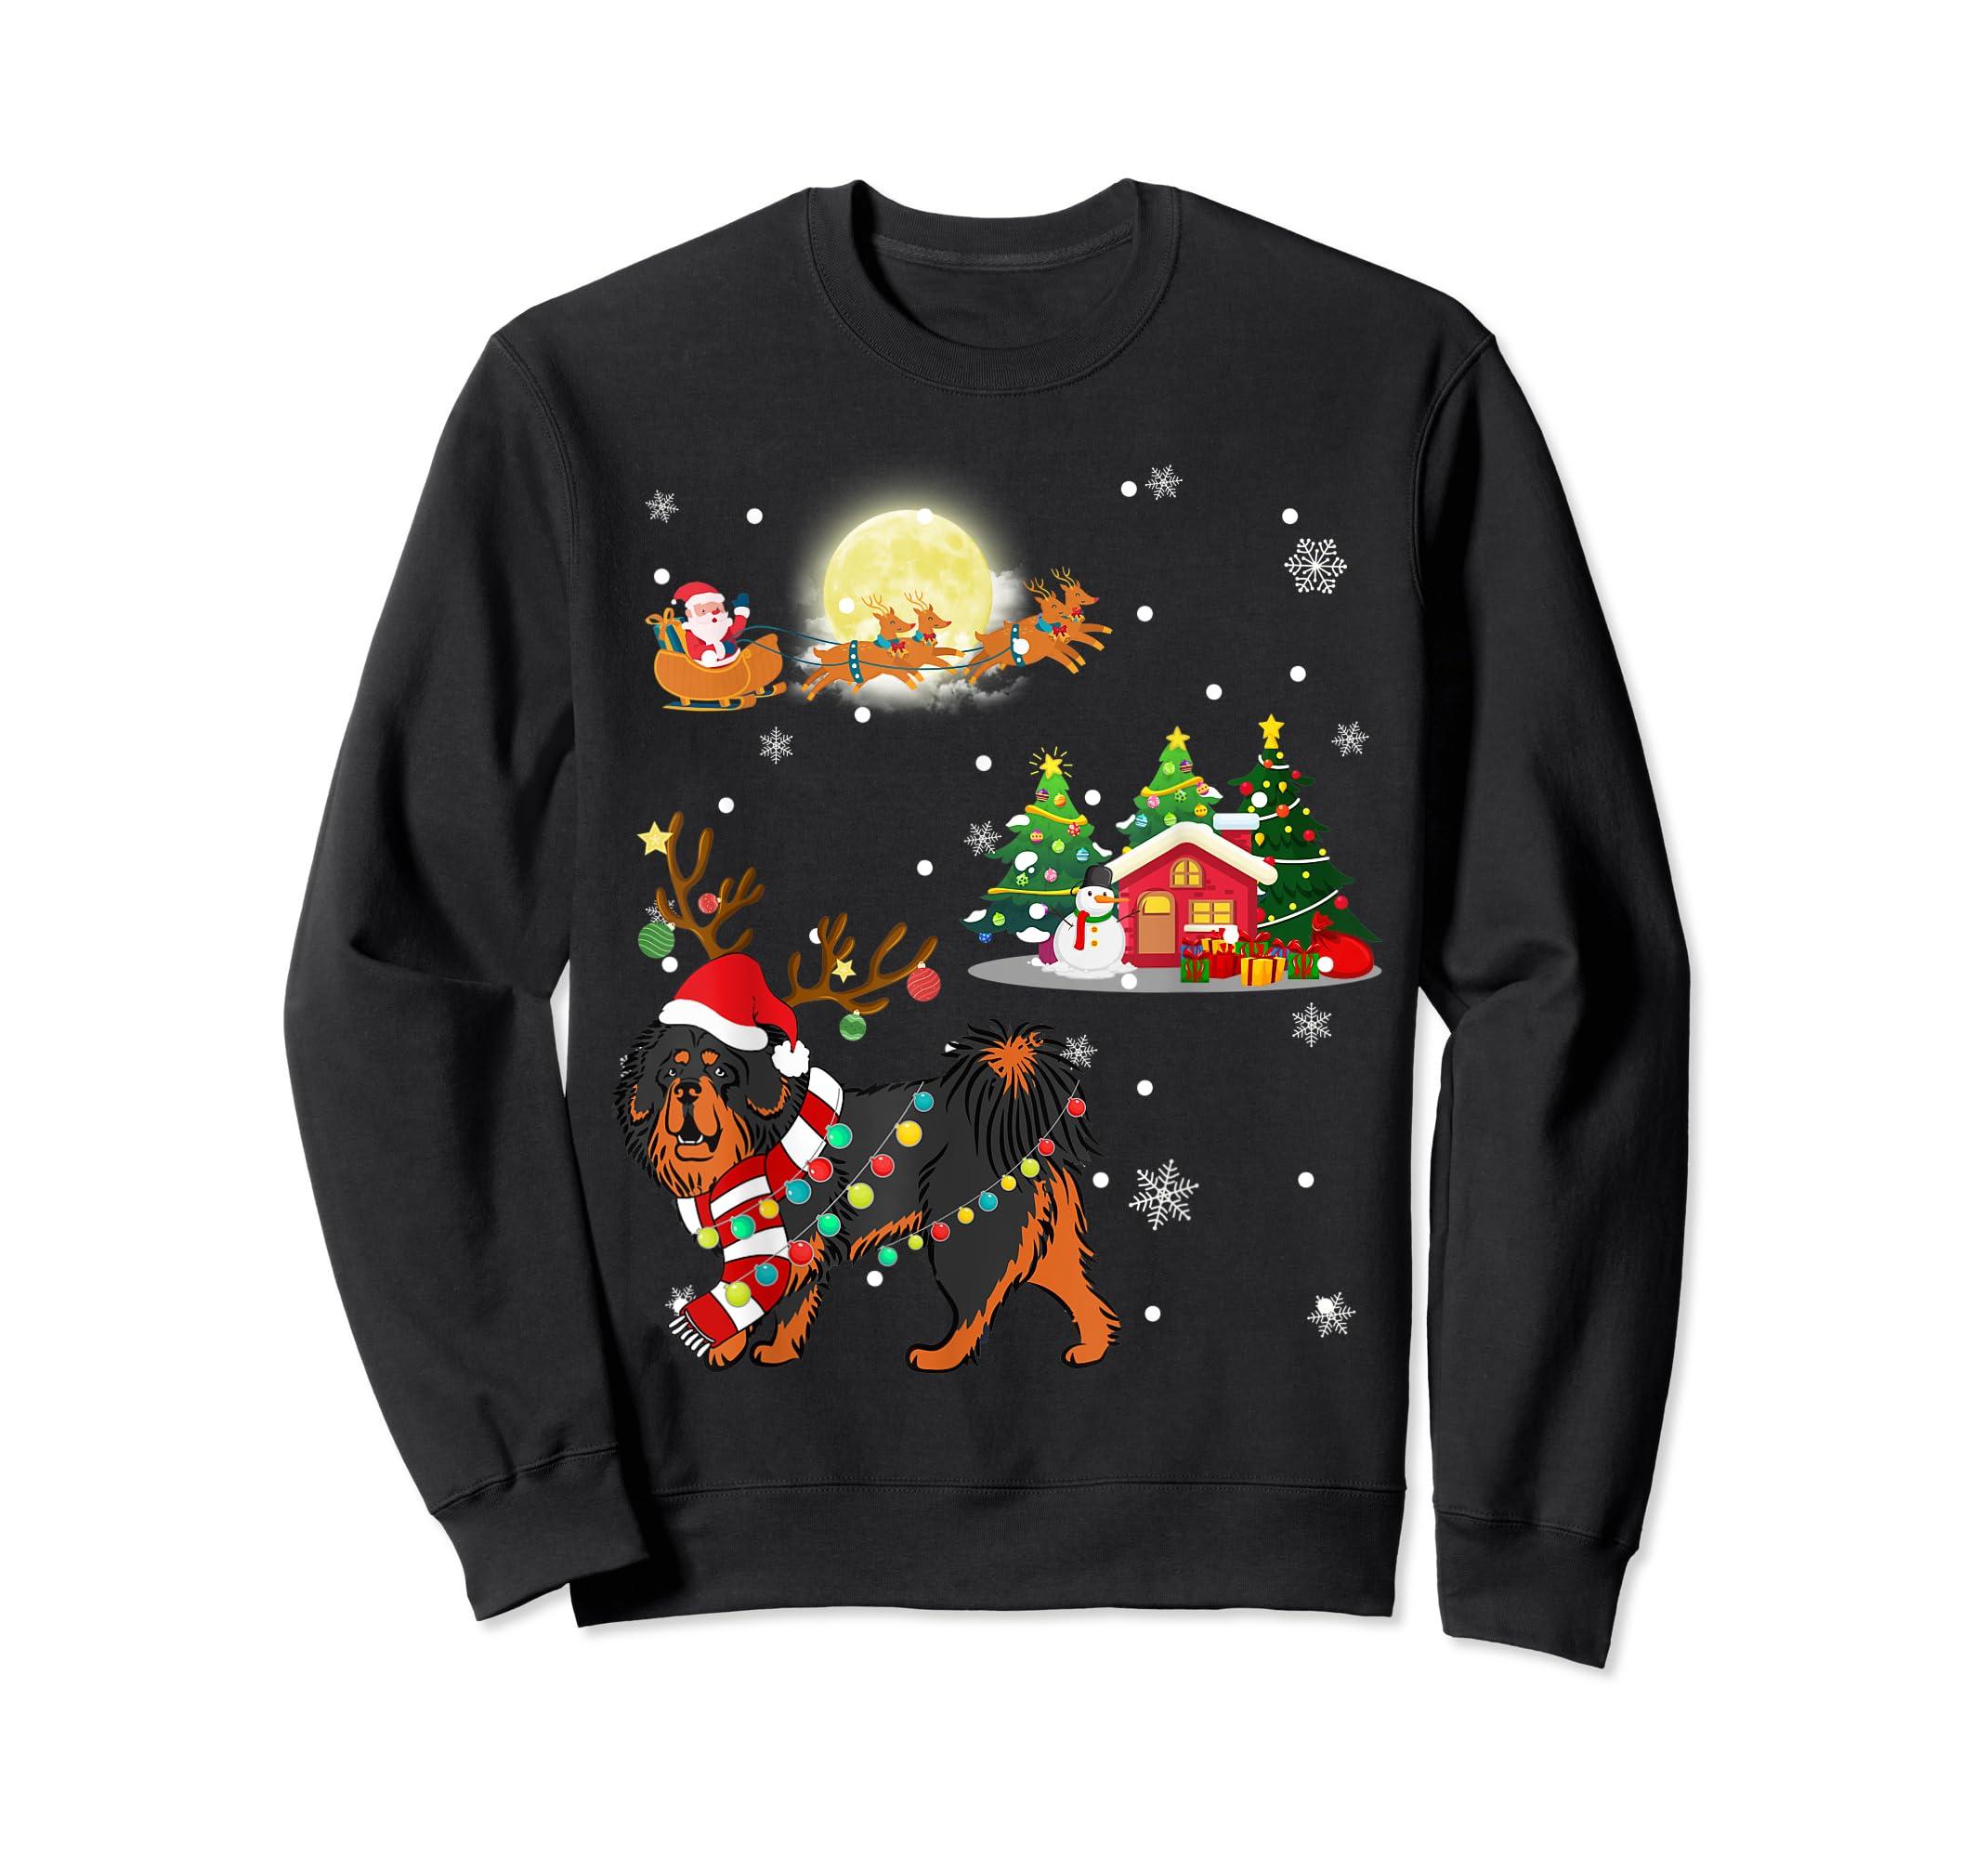 Tibetan Mastiff Dog Led Light Christmas 2019 Gift T-Shirt-Sweatshirt-Black